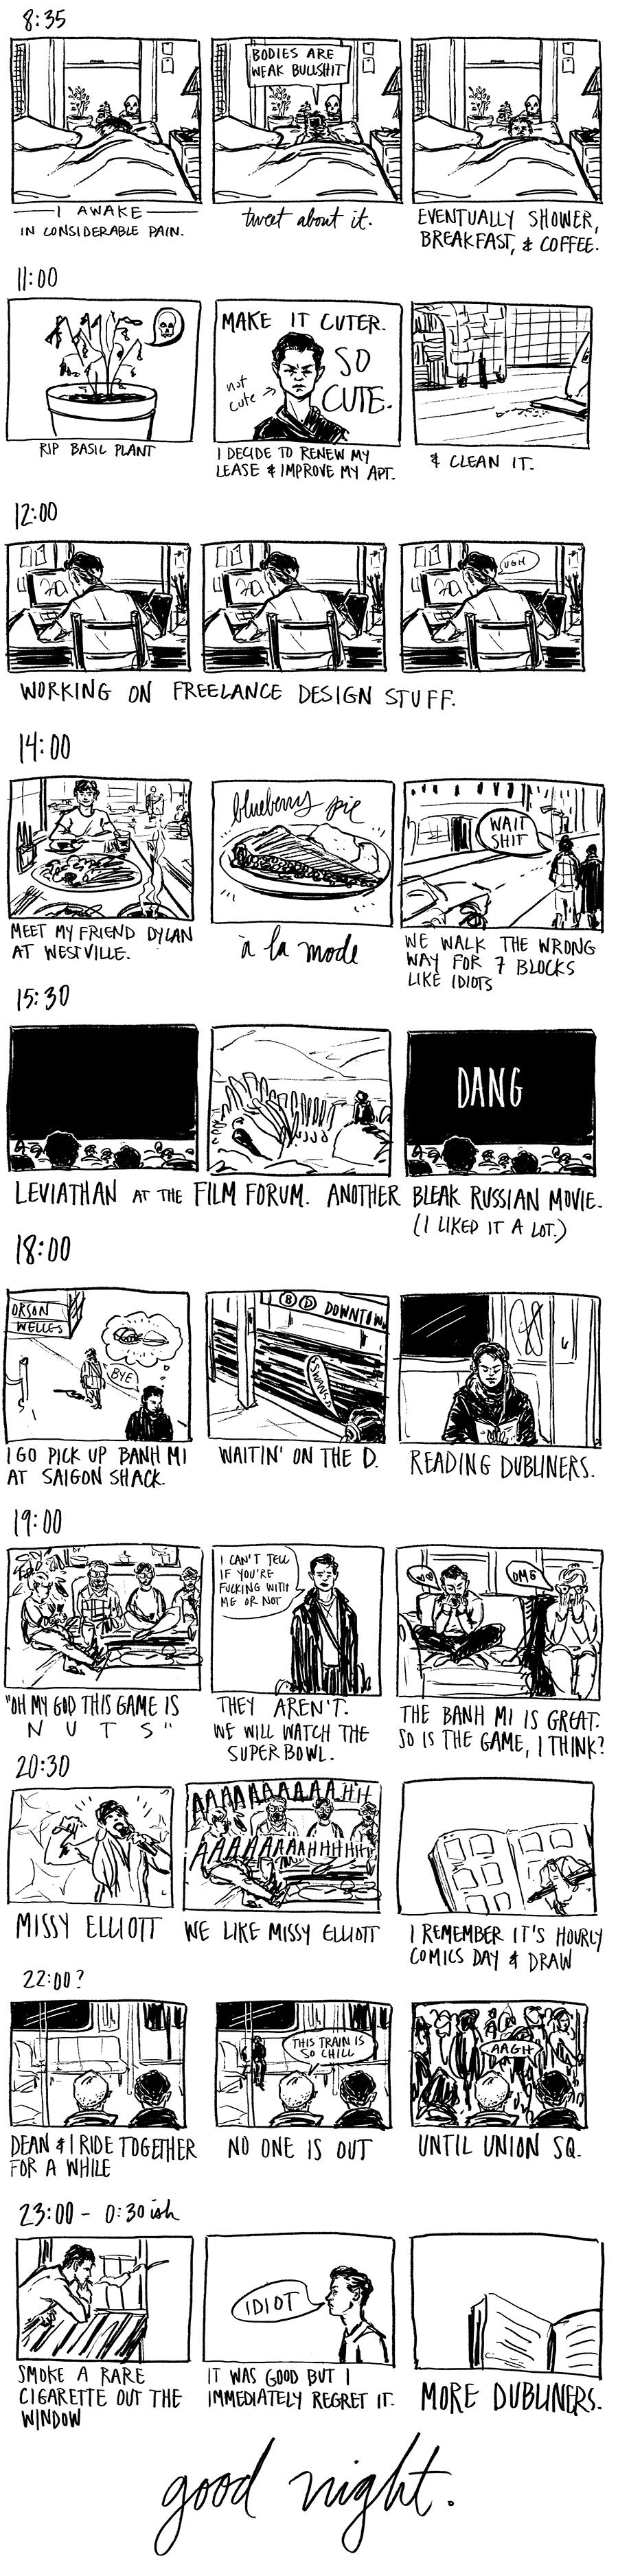 Hourly Comics Day 2015